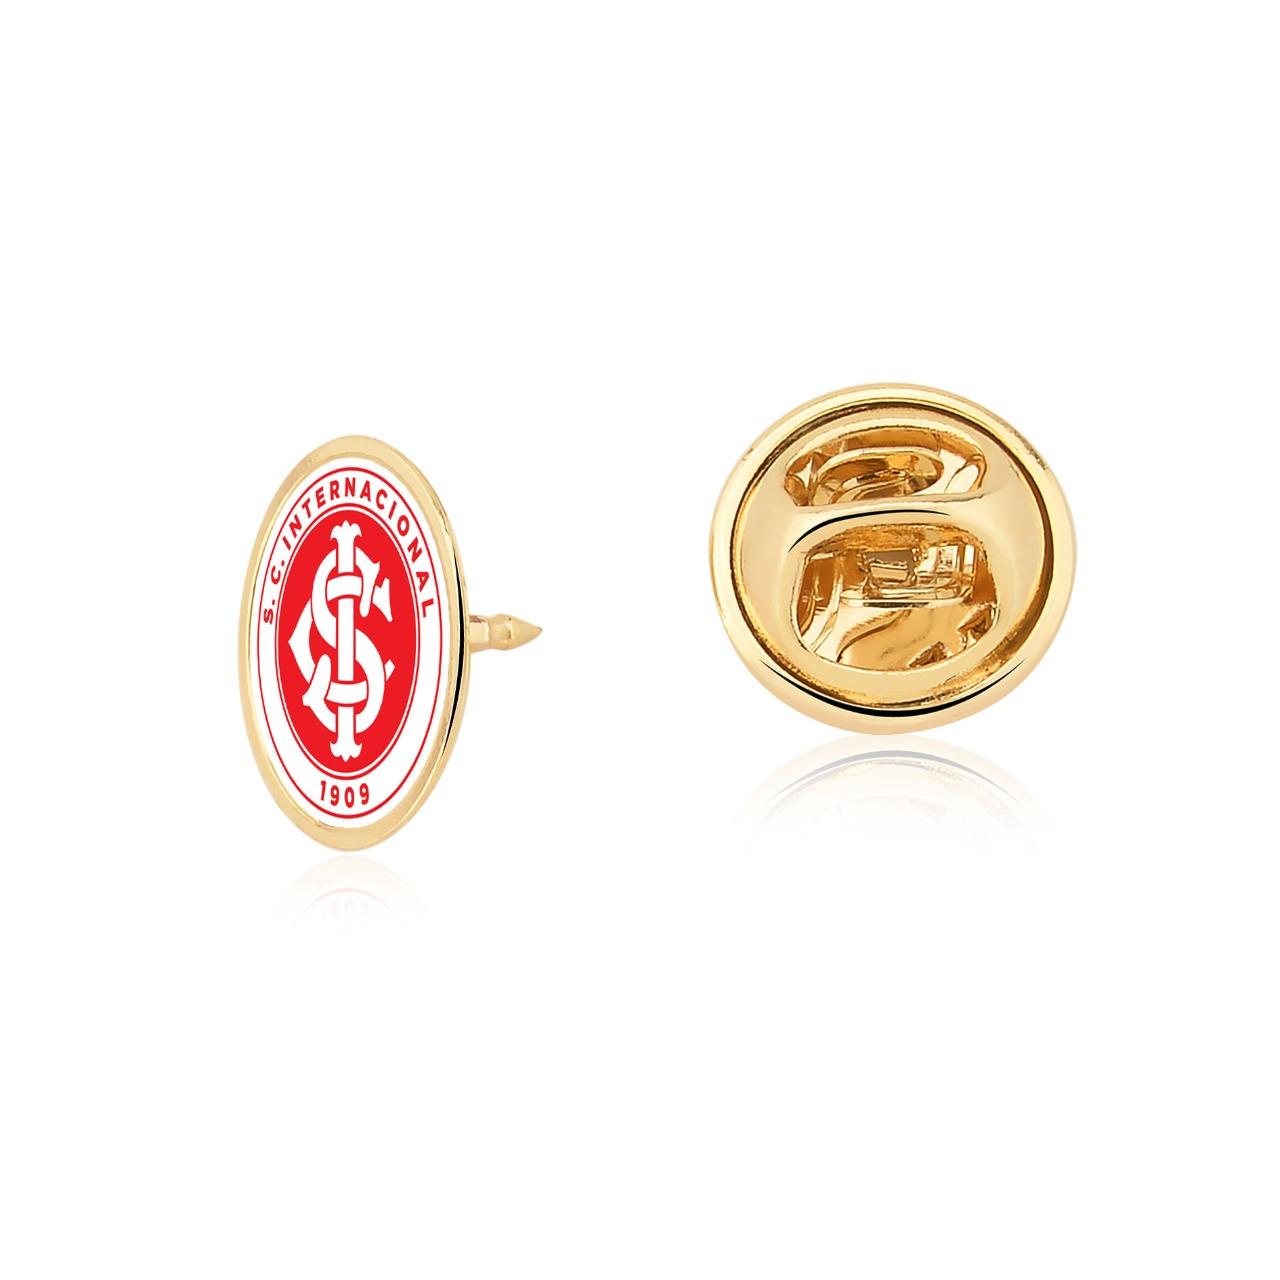 Pin 1 cm SCI Internacional Folheado Ouro 18k